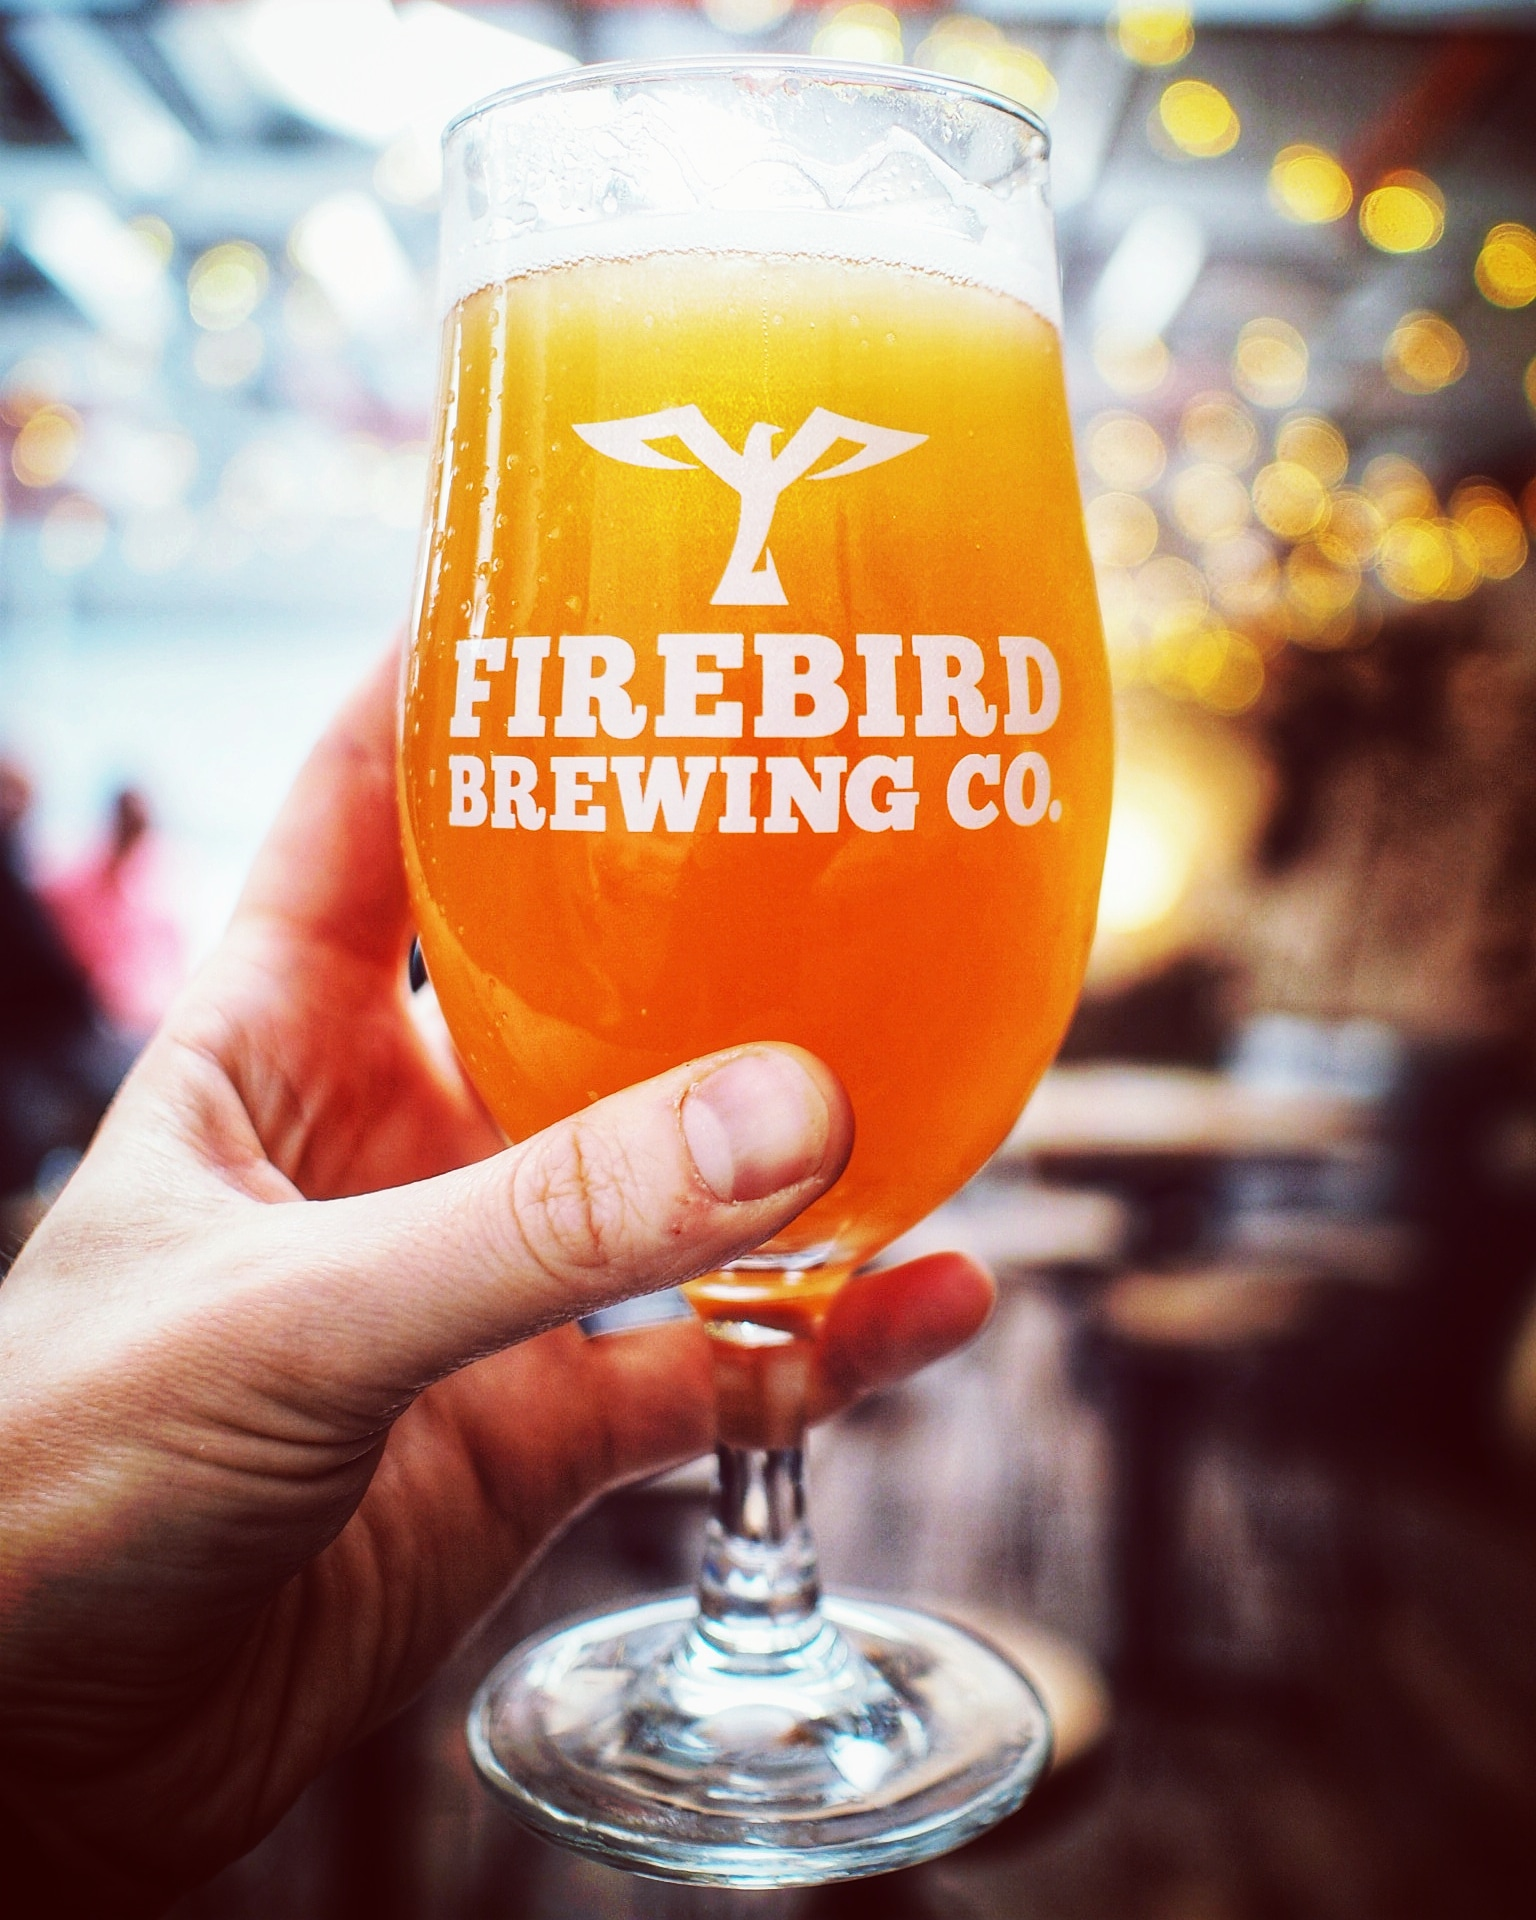 firebird brewing co branded glass